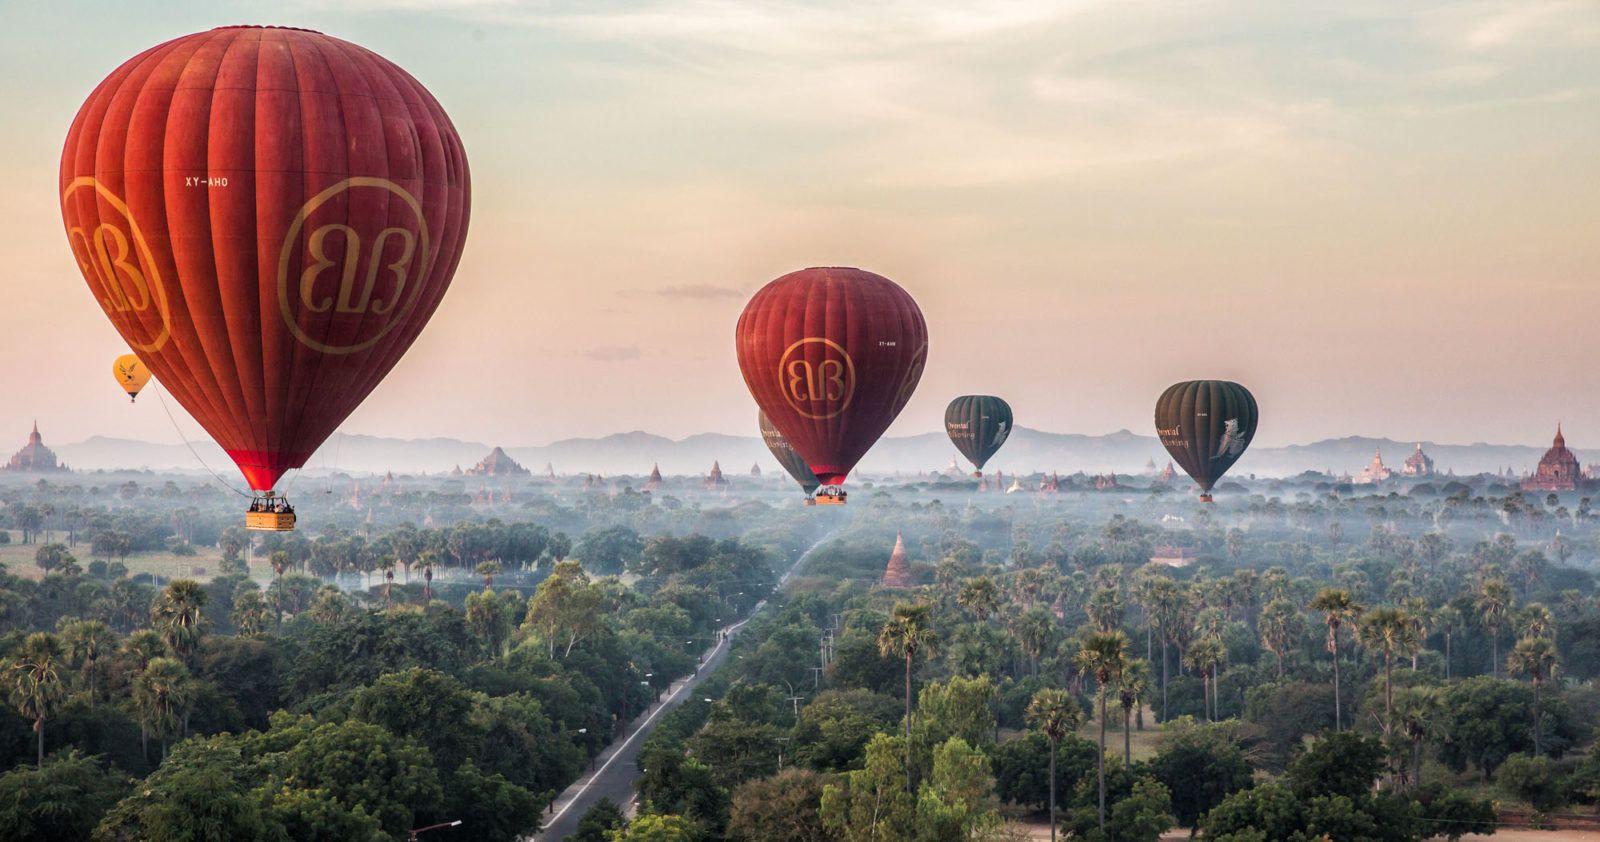 Myanmar Hot Air Balloon